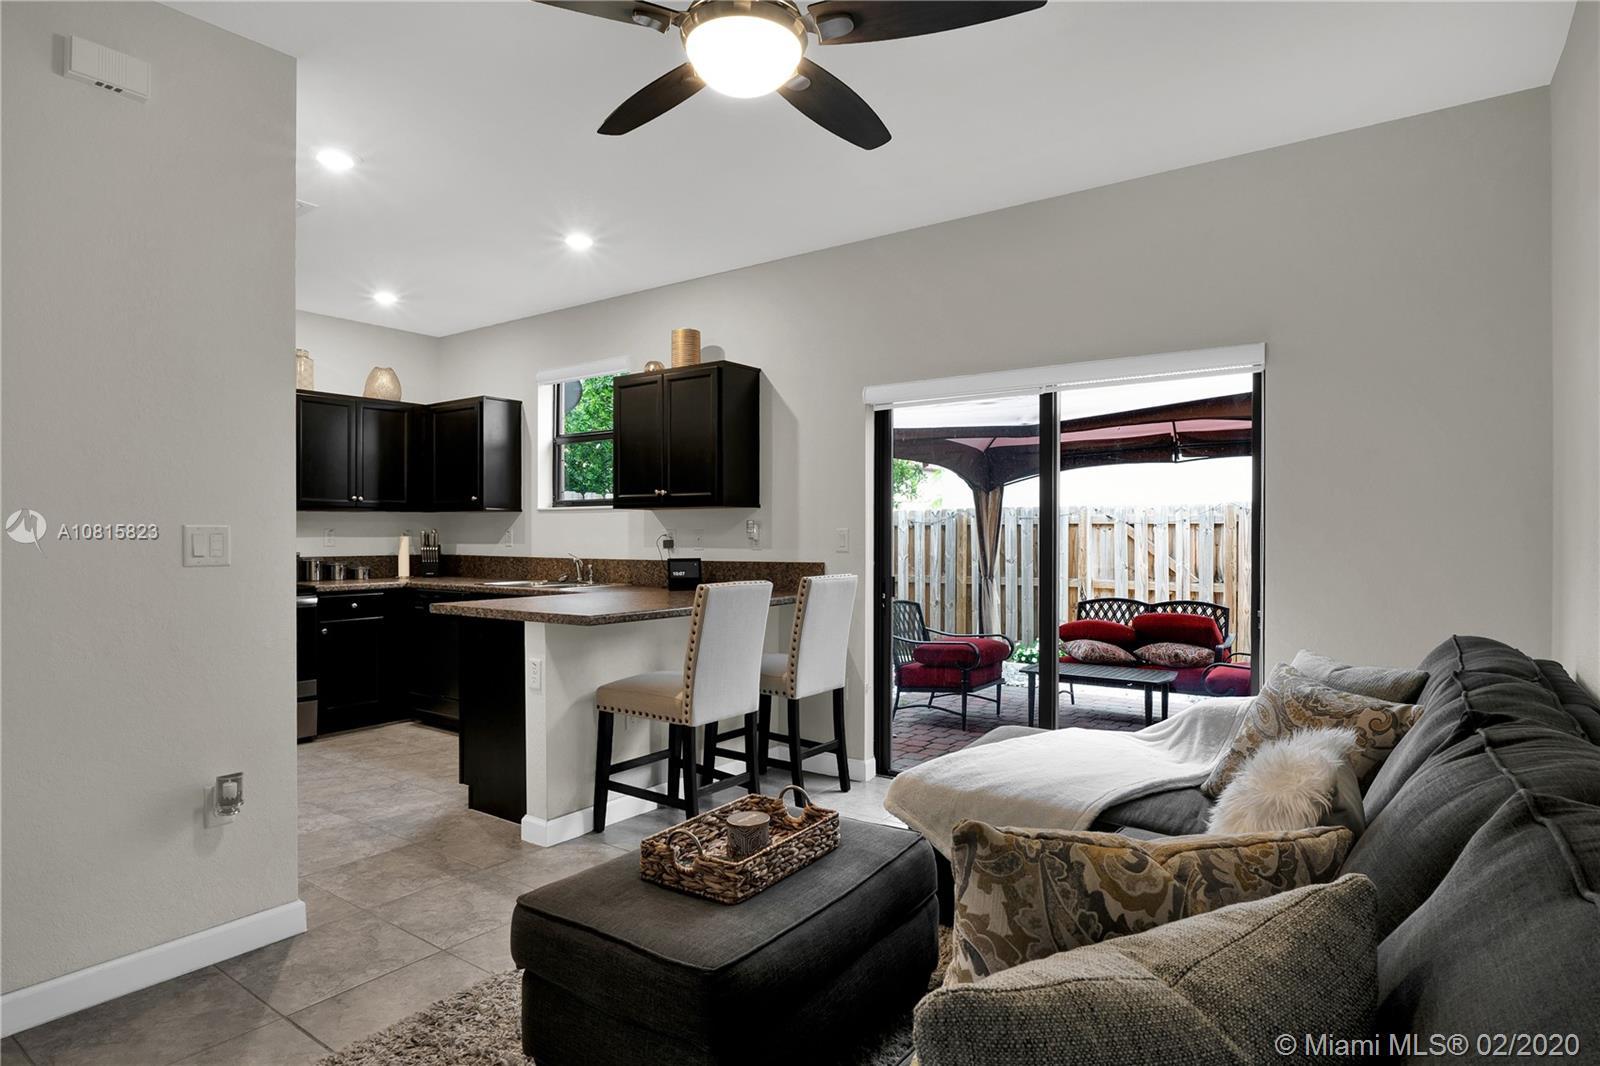 124 SE 34th Ter #124, Homestead, FL 33033 - Homestead, FL real estate listing